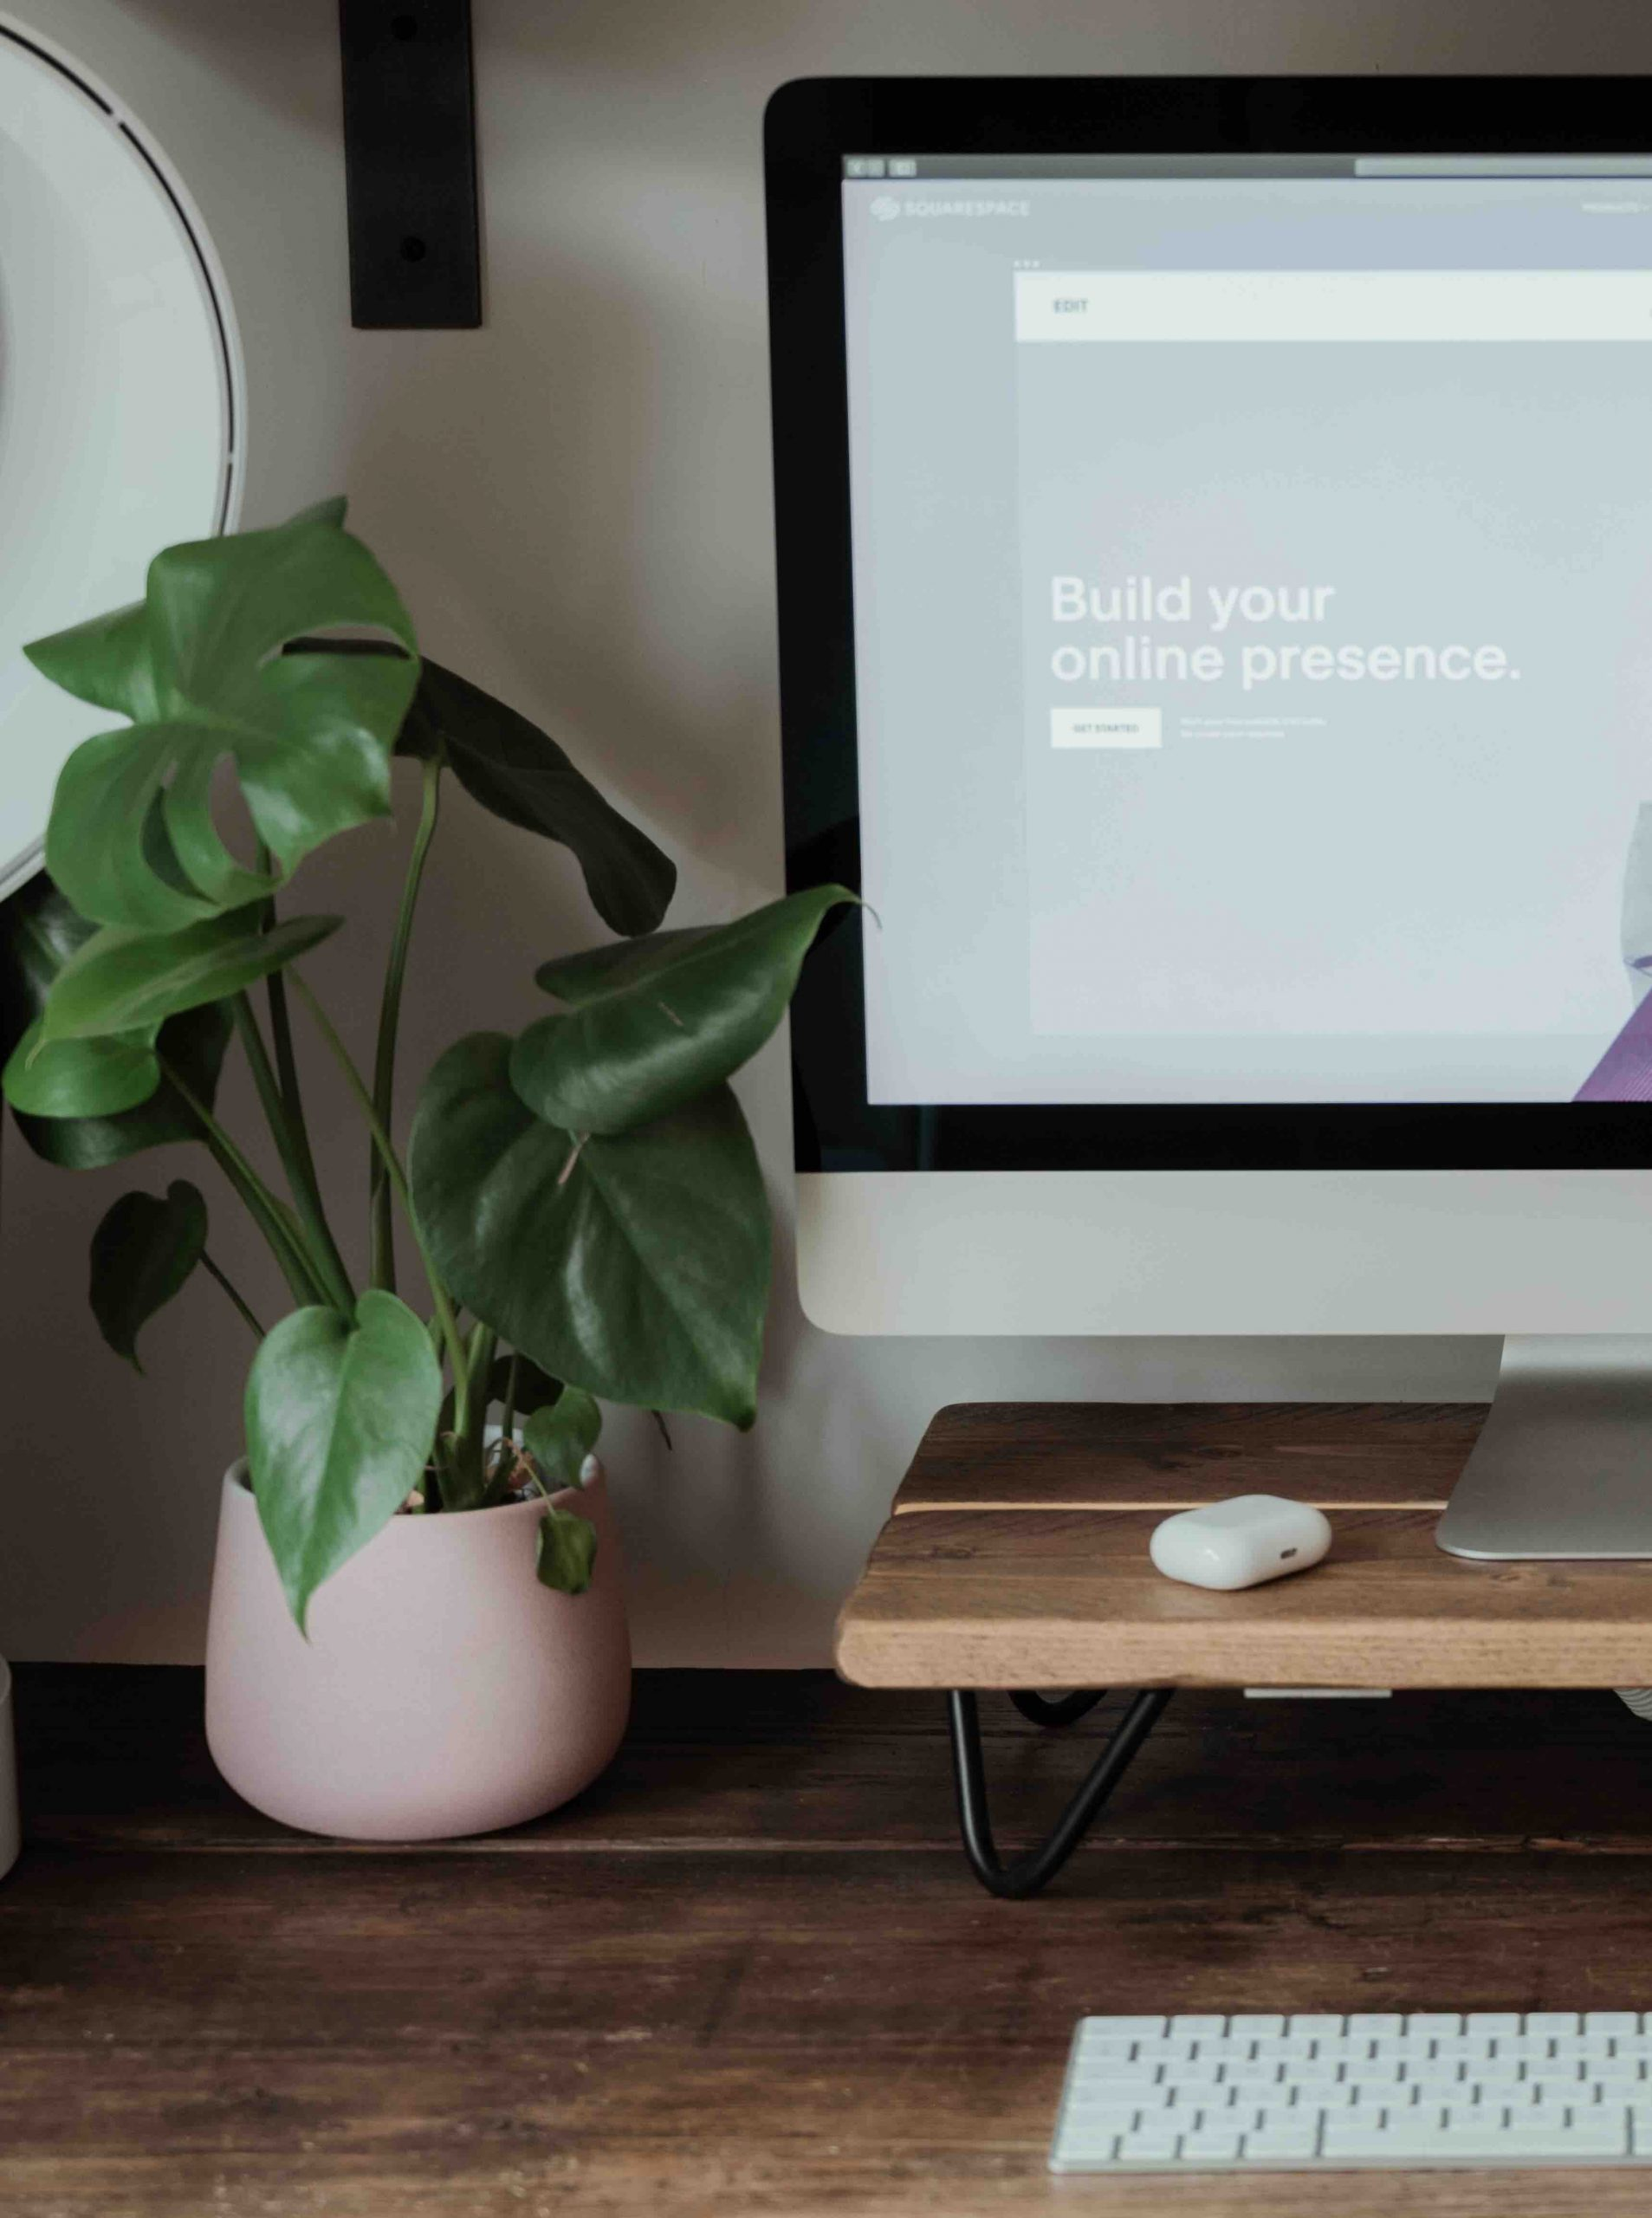 Mejores Soportes Monitor, mejora tu ergonomía en casa ortodinamics.com